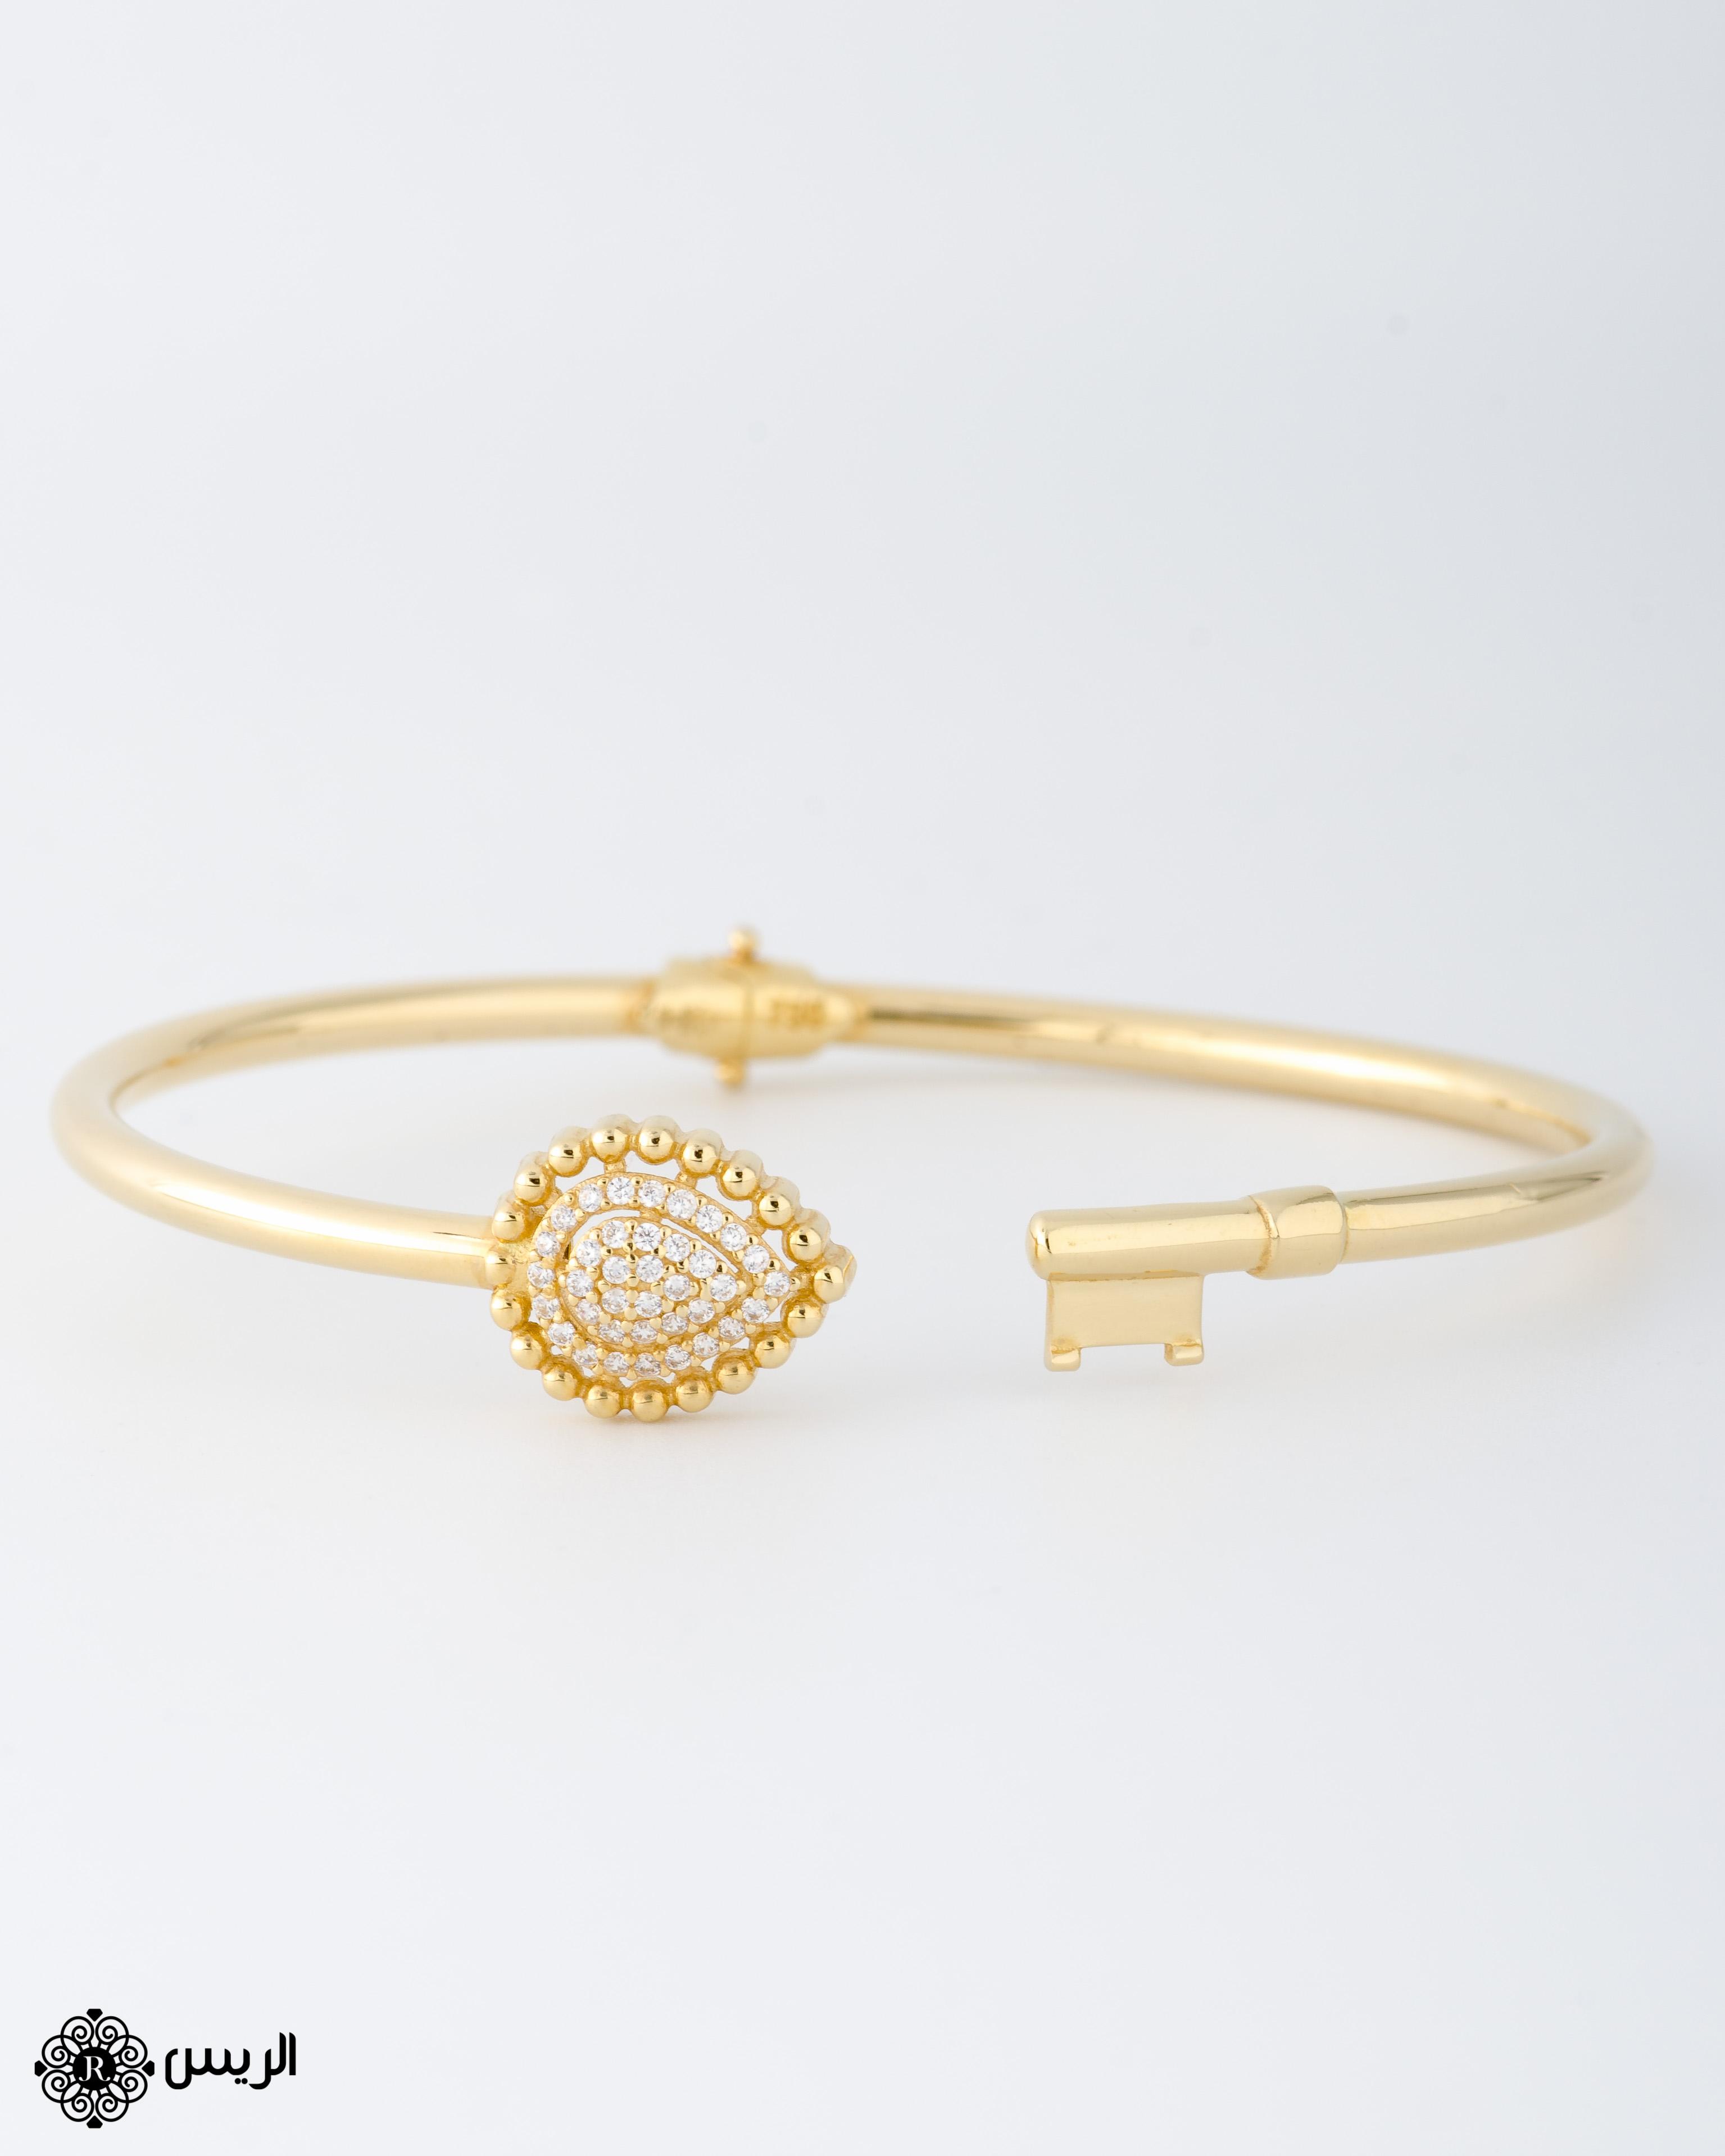 Raies jewelry Bangle Key Casual Design إسورة تصميم سبور مفتاح الريس للمجوهرات